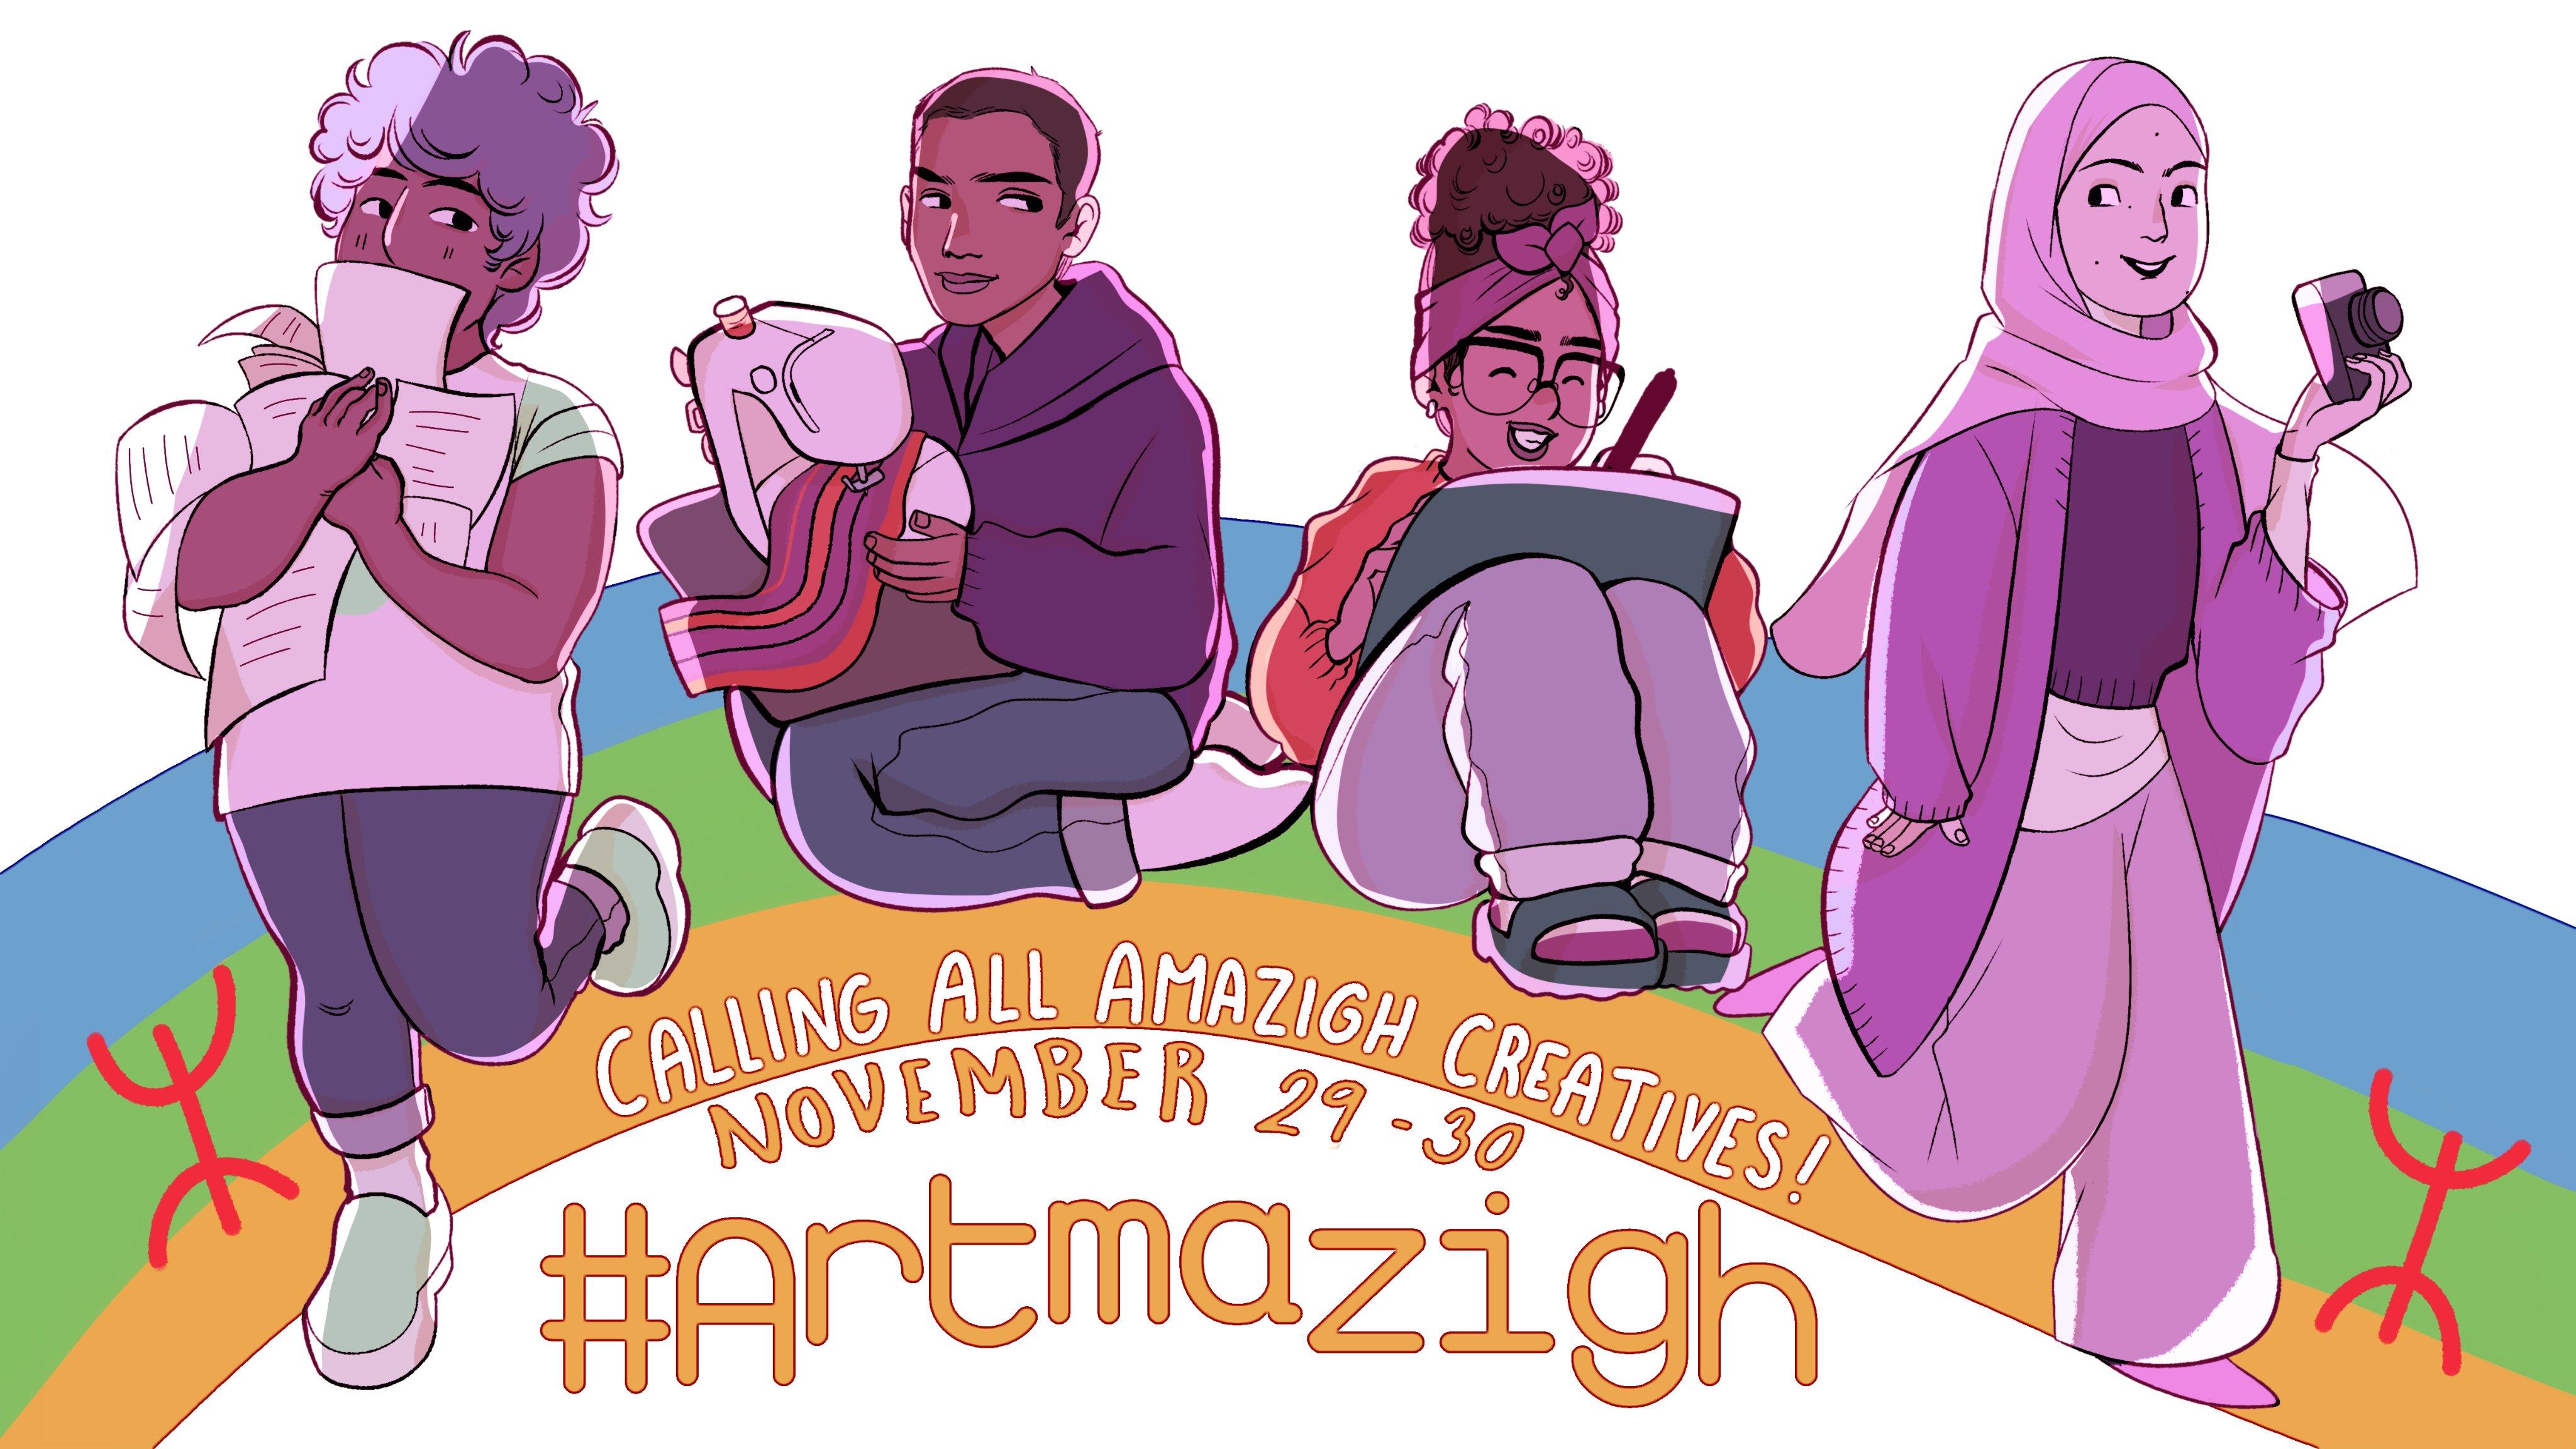 #Artmazigh Day showcases cultural art through pride